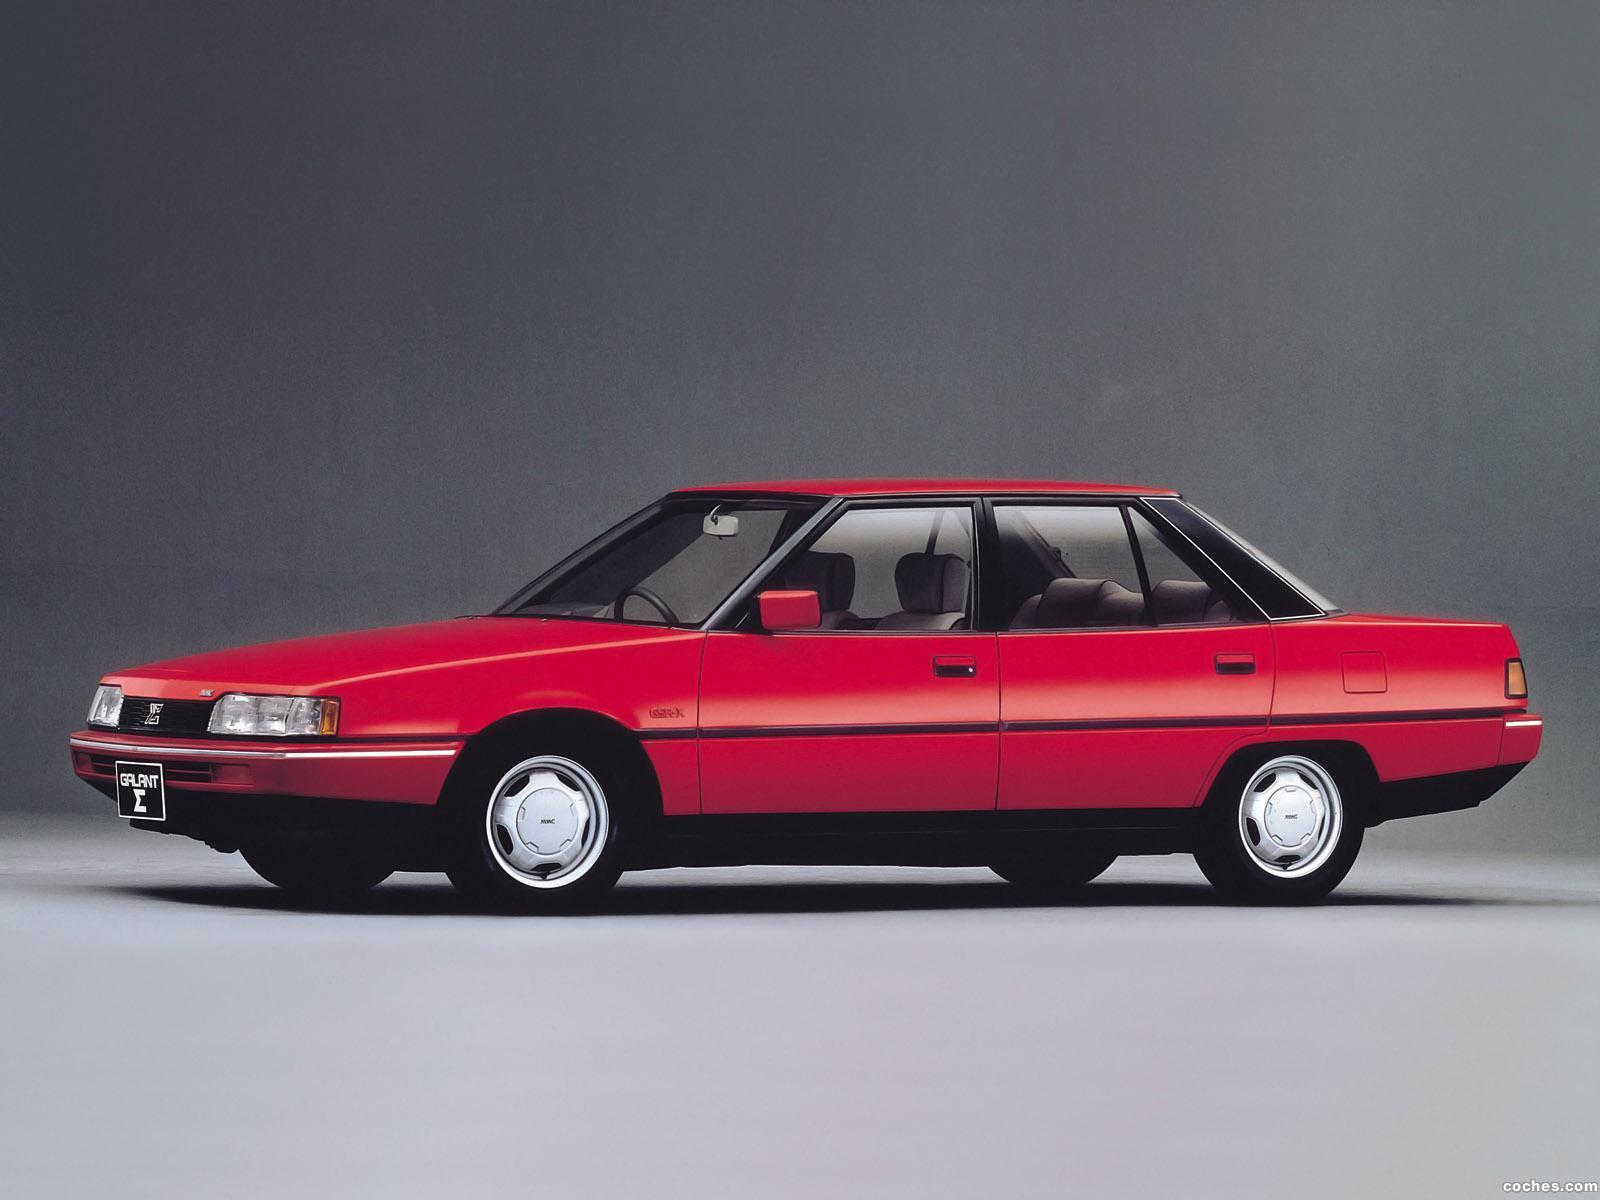 Foto 0 de Mitsubishi Galant 2000 GSR-X Turbo 1983